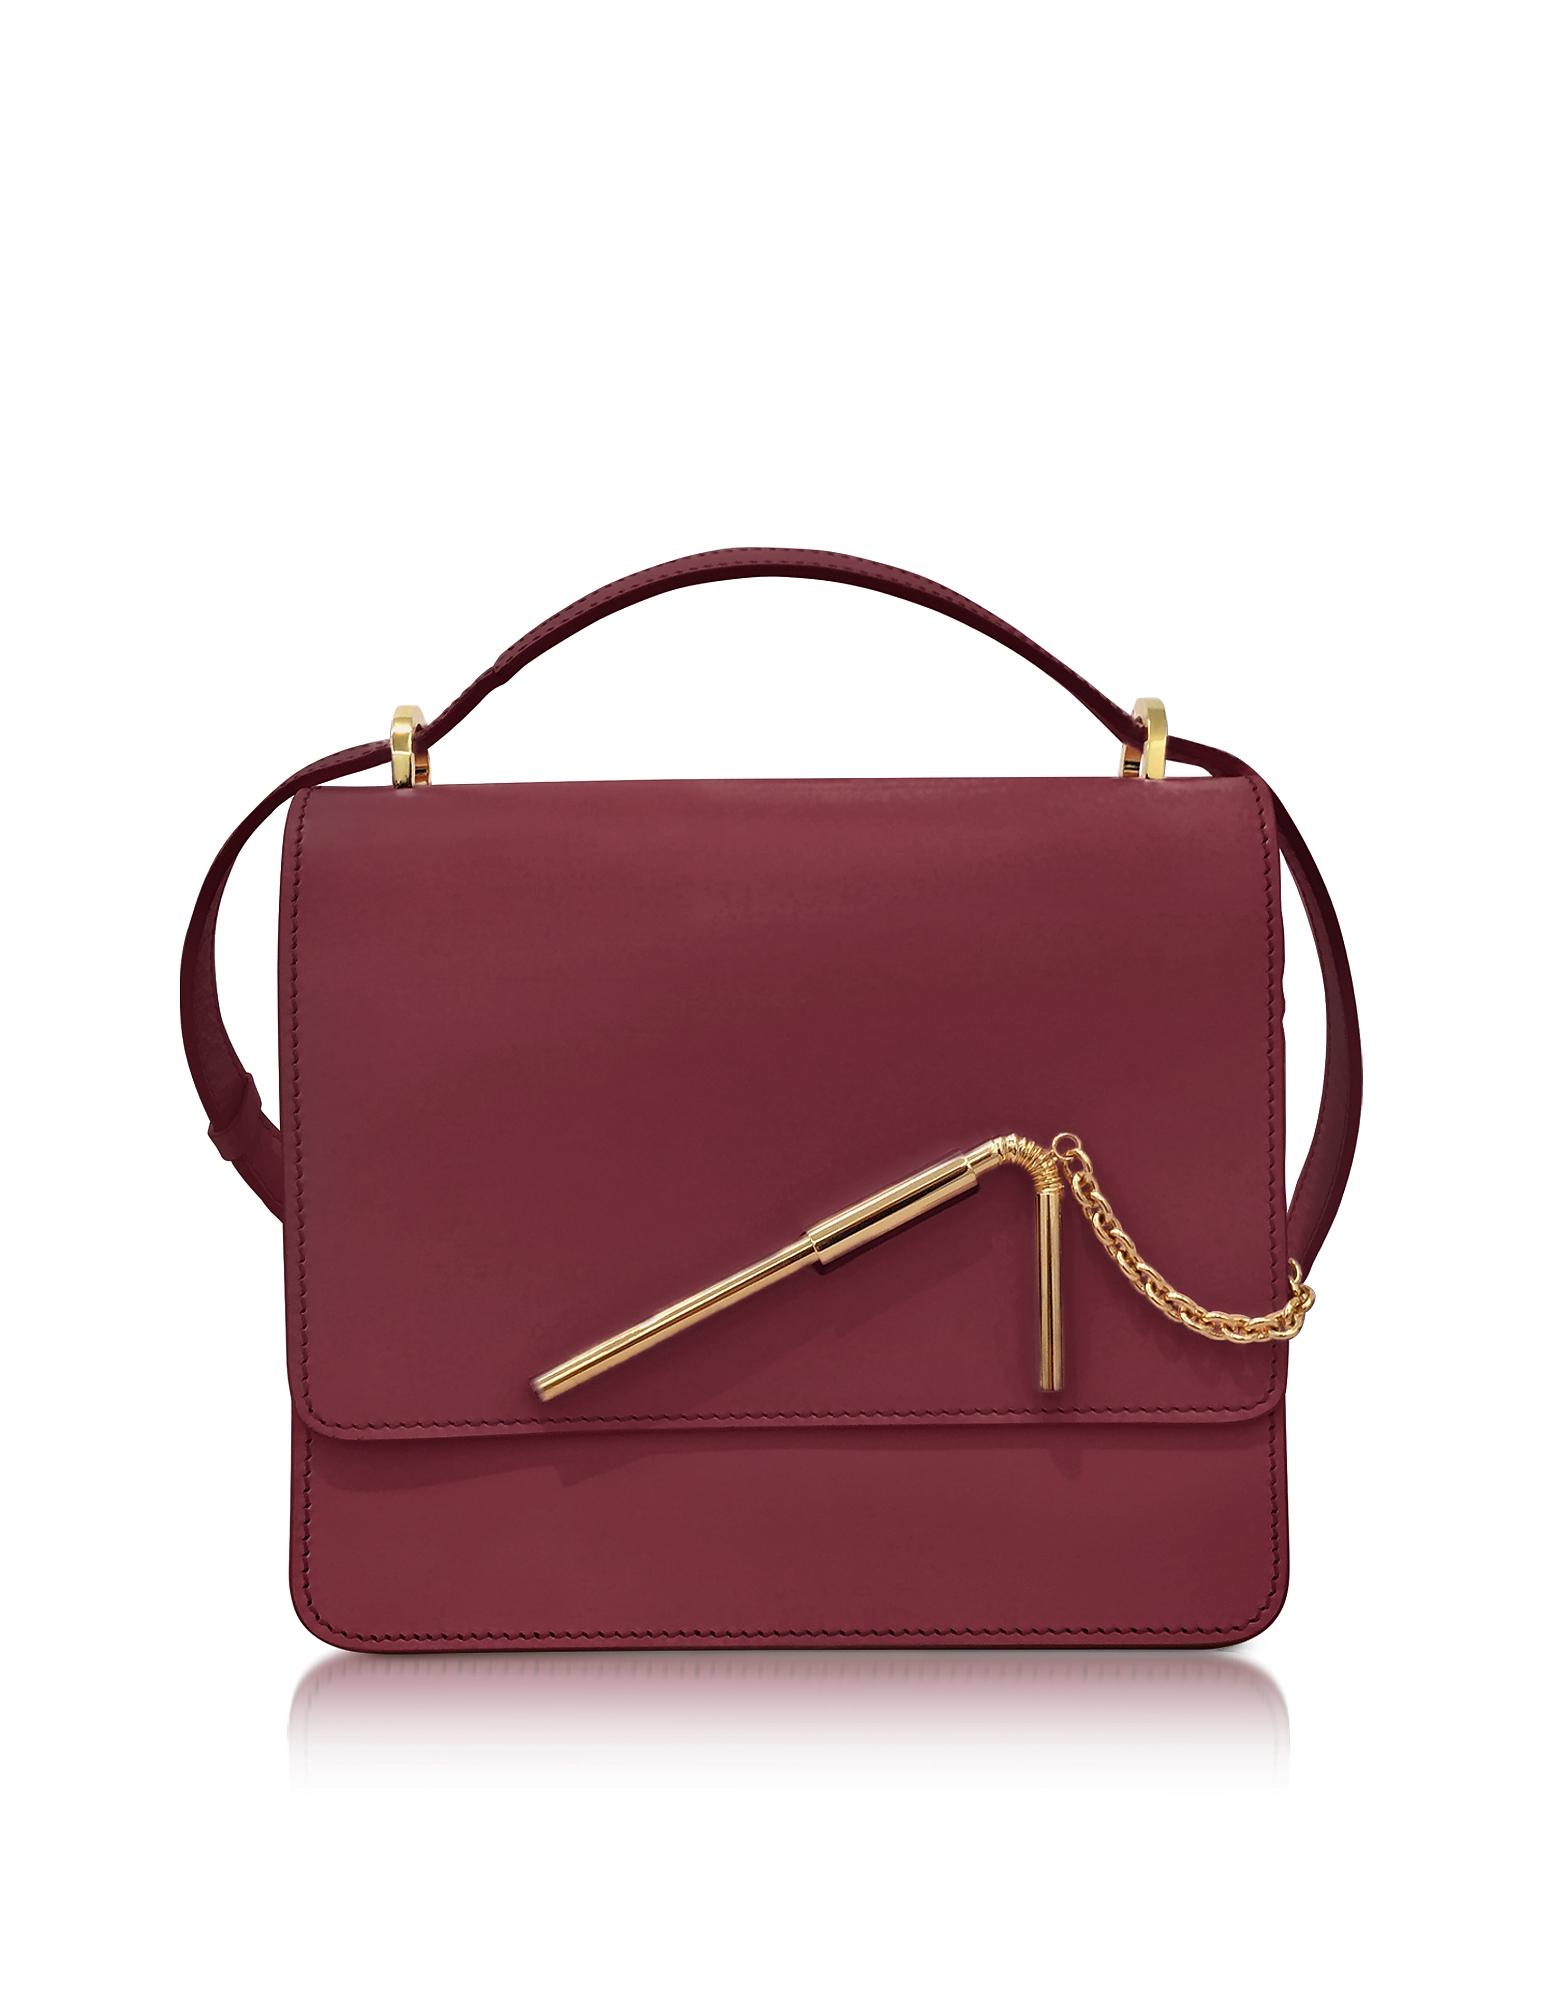 Sophie Hulme Handbags, Dark Red Medium Straw Bag